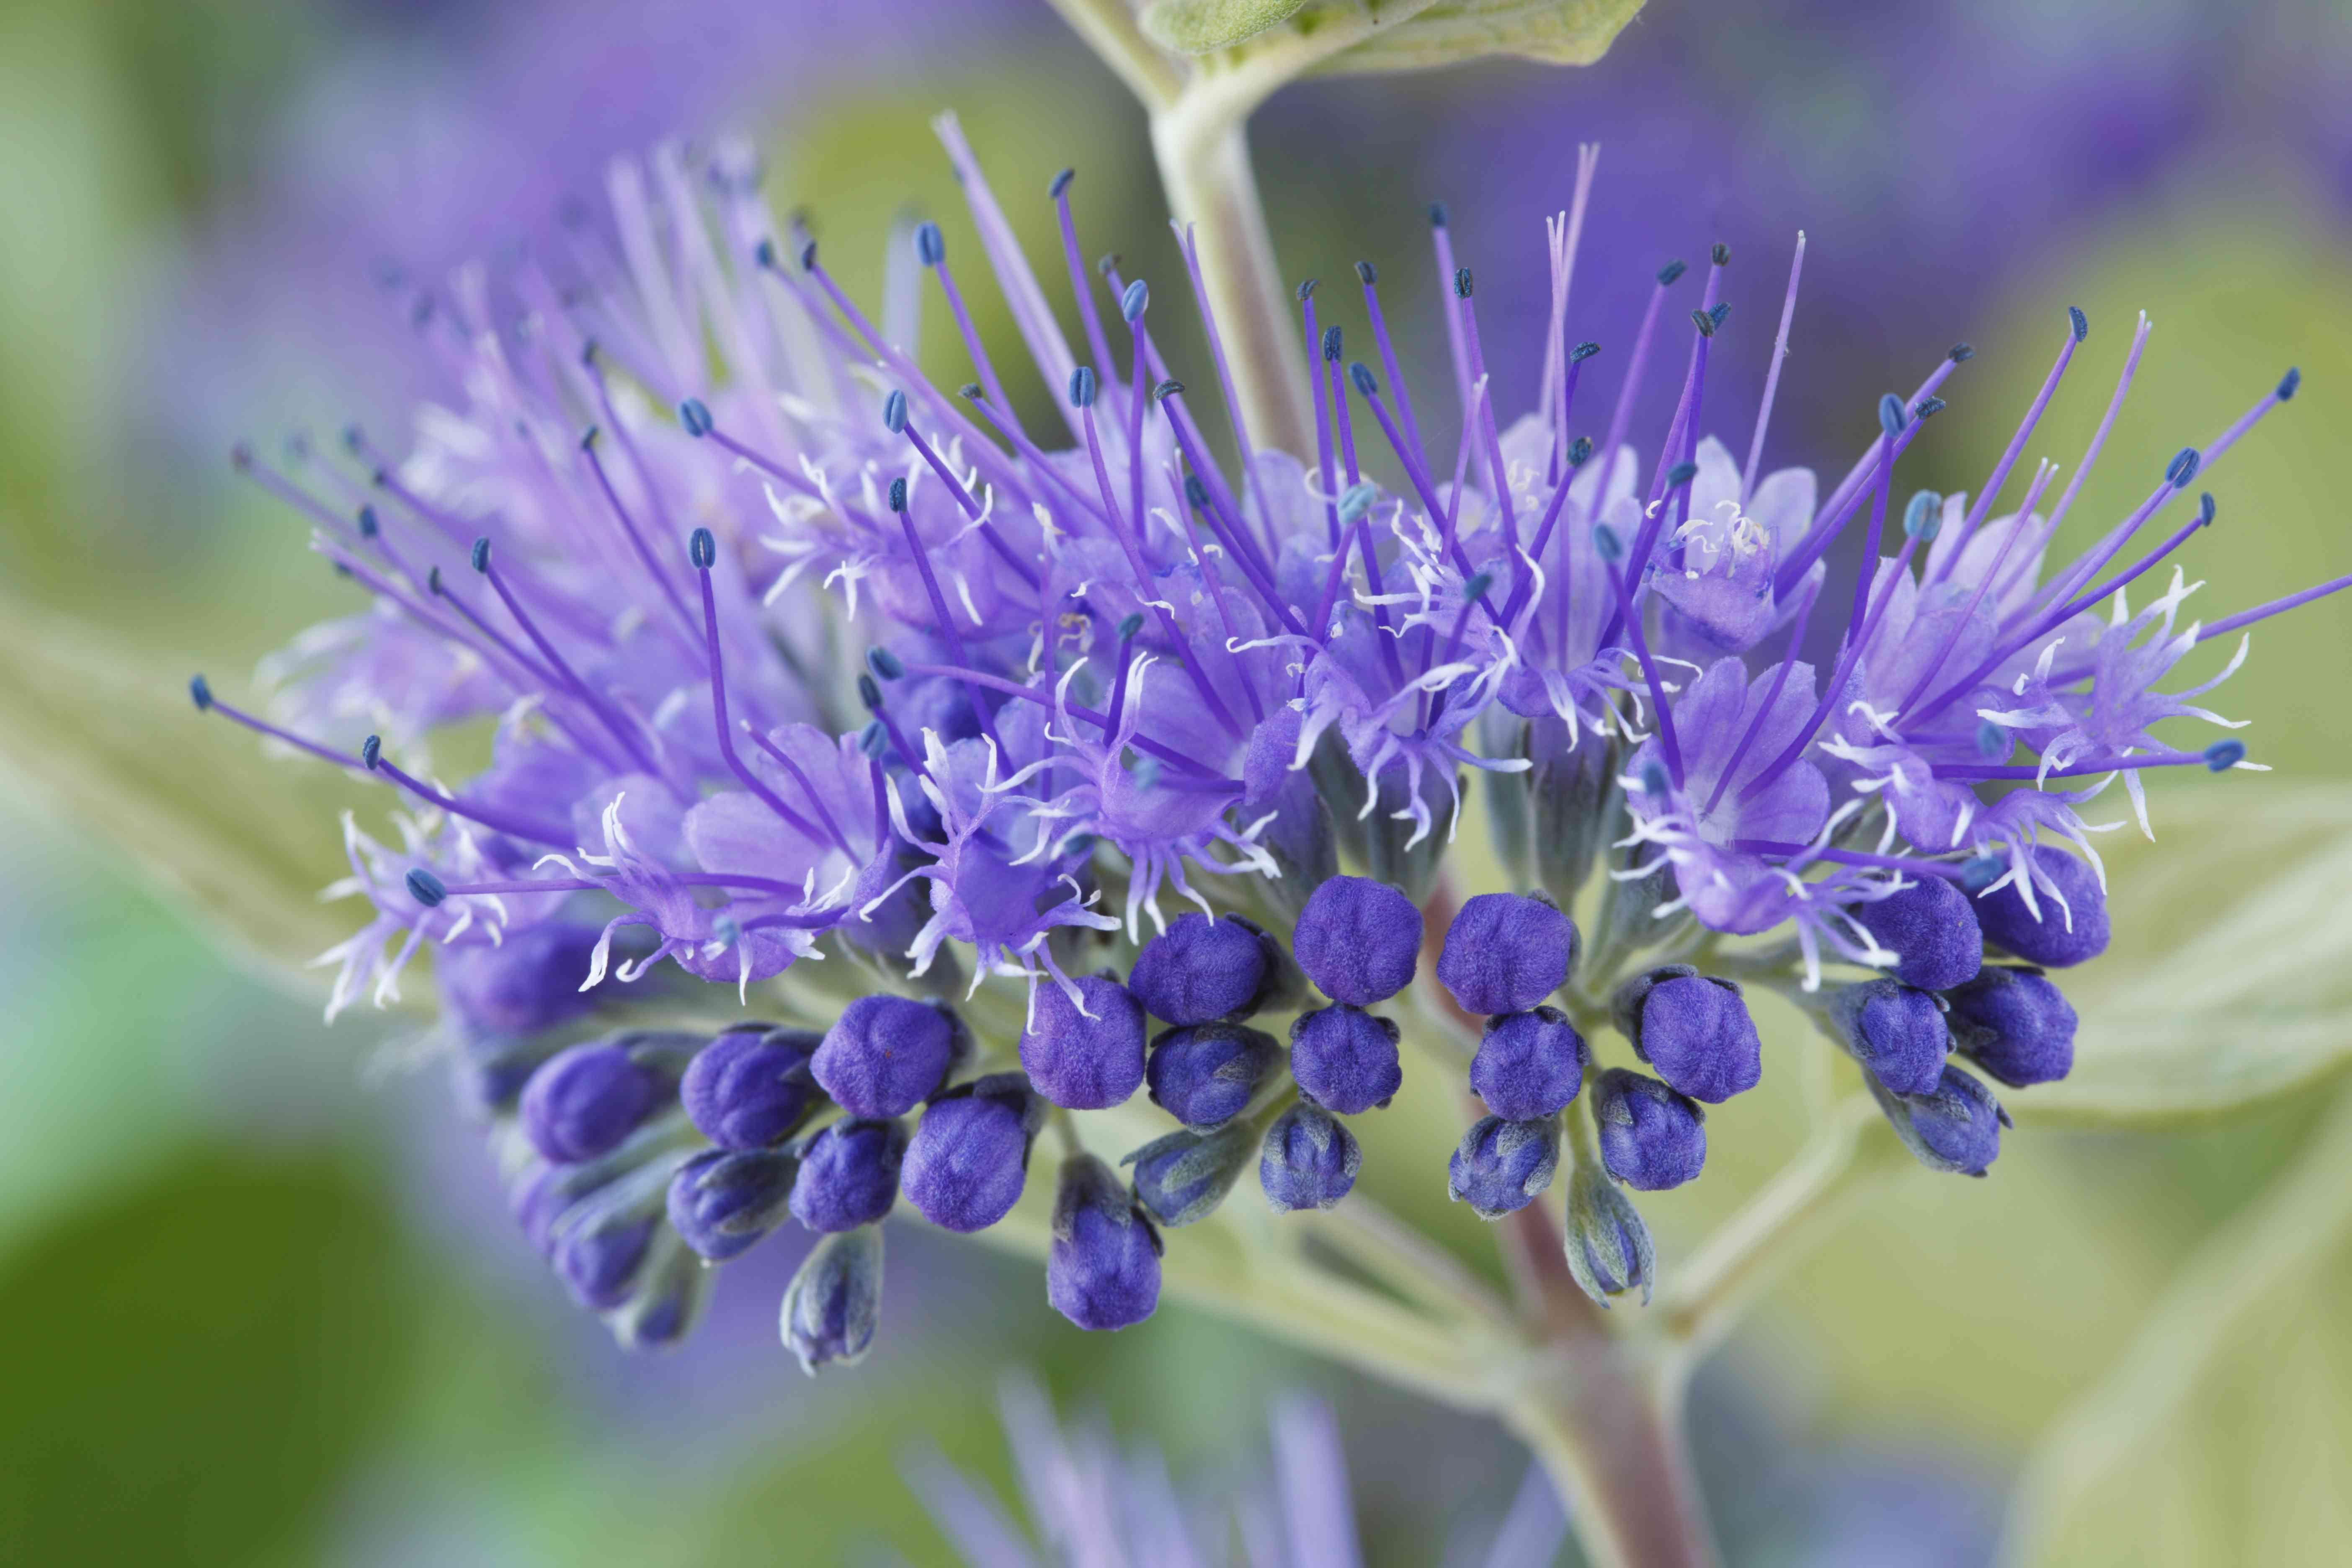 Blue Mist Spiraea (Caryopteris x clandonensis) 'Worcester Gold', September